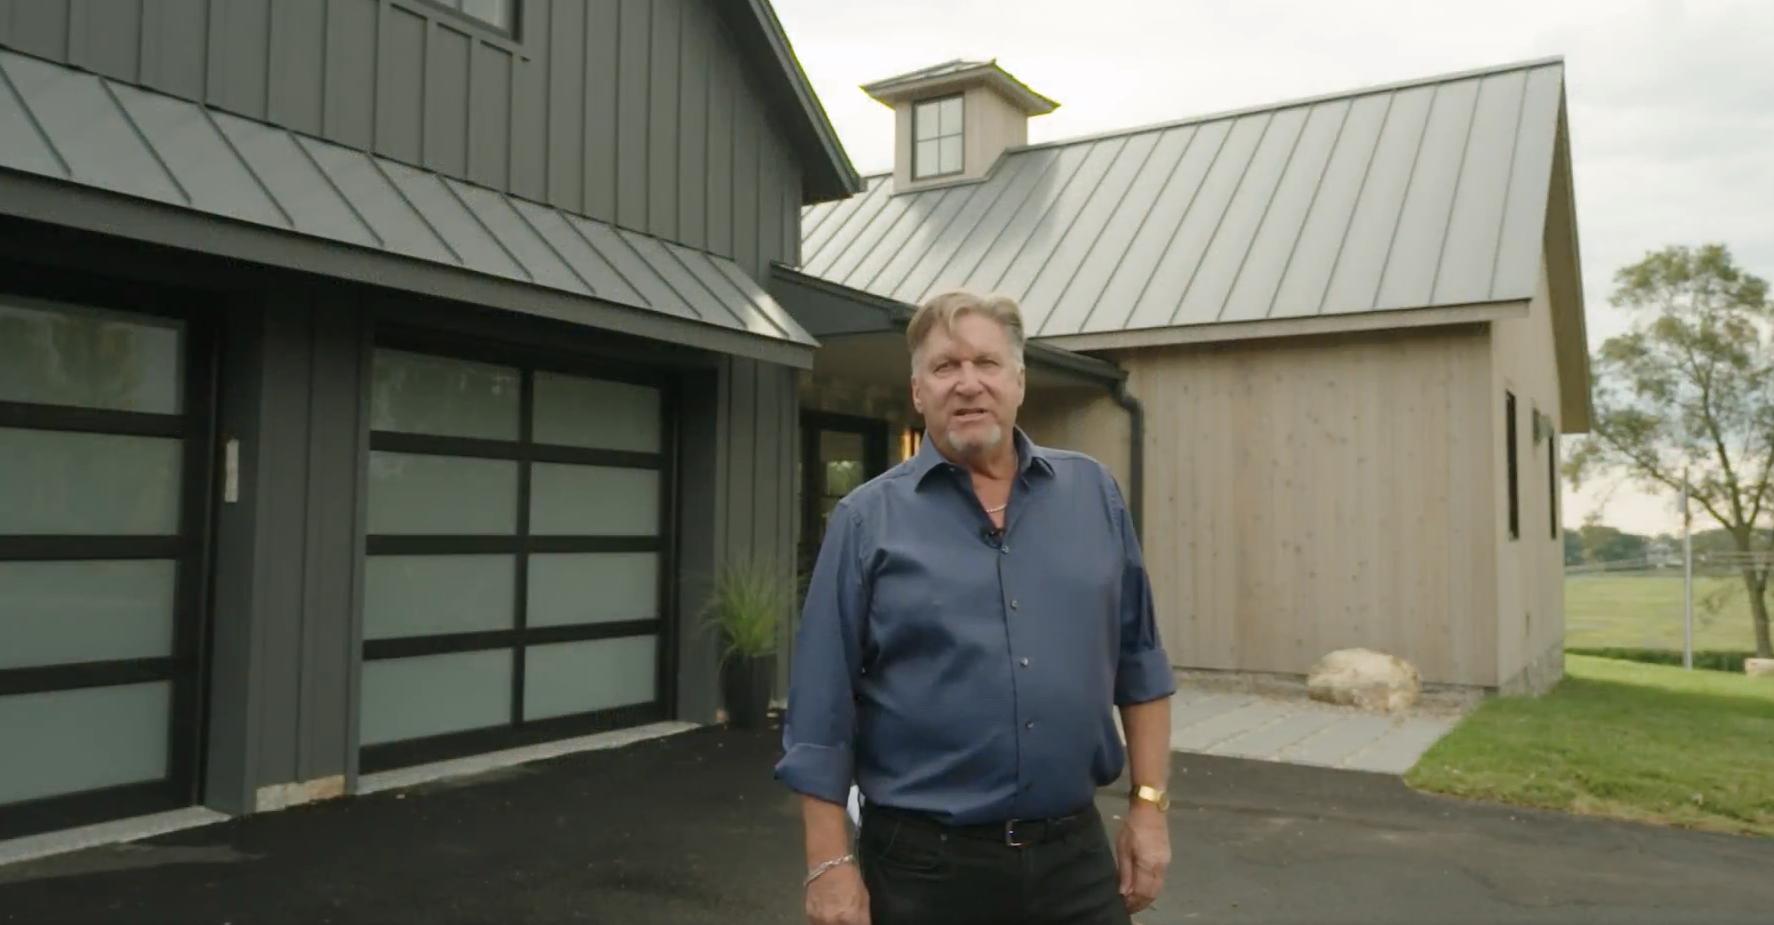 Builder Jerry Effren of Greyrock Homes